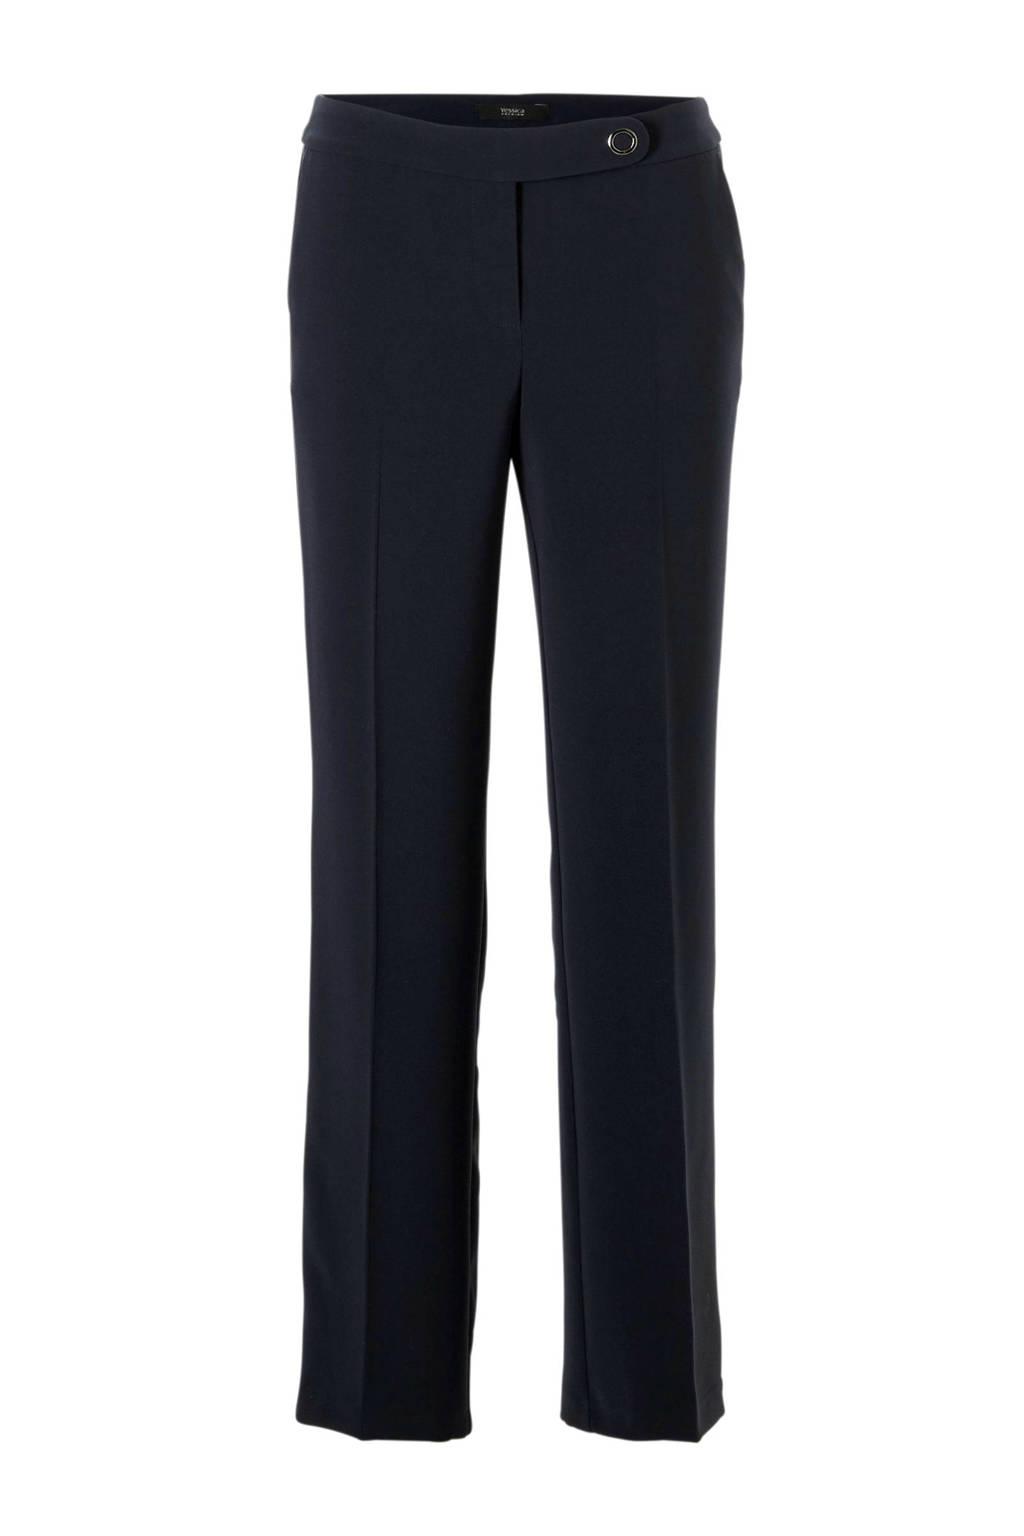 C&A Yessica pantalon blauw, Blauw